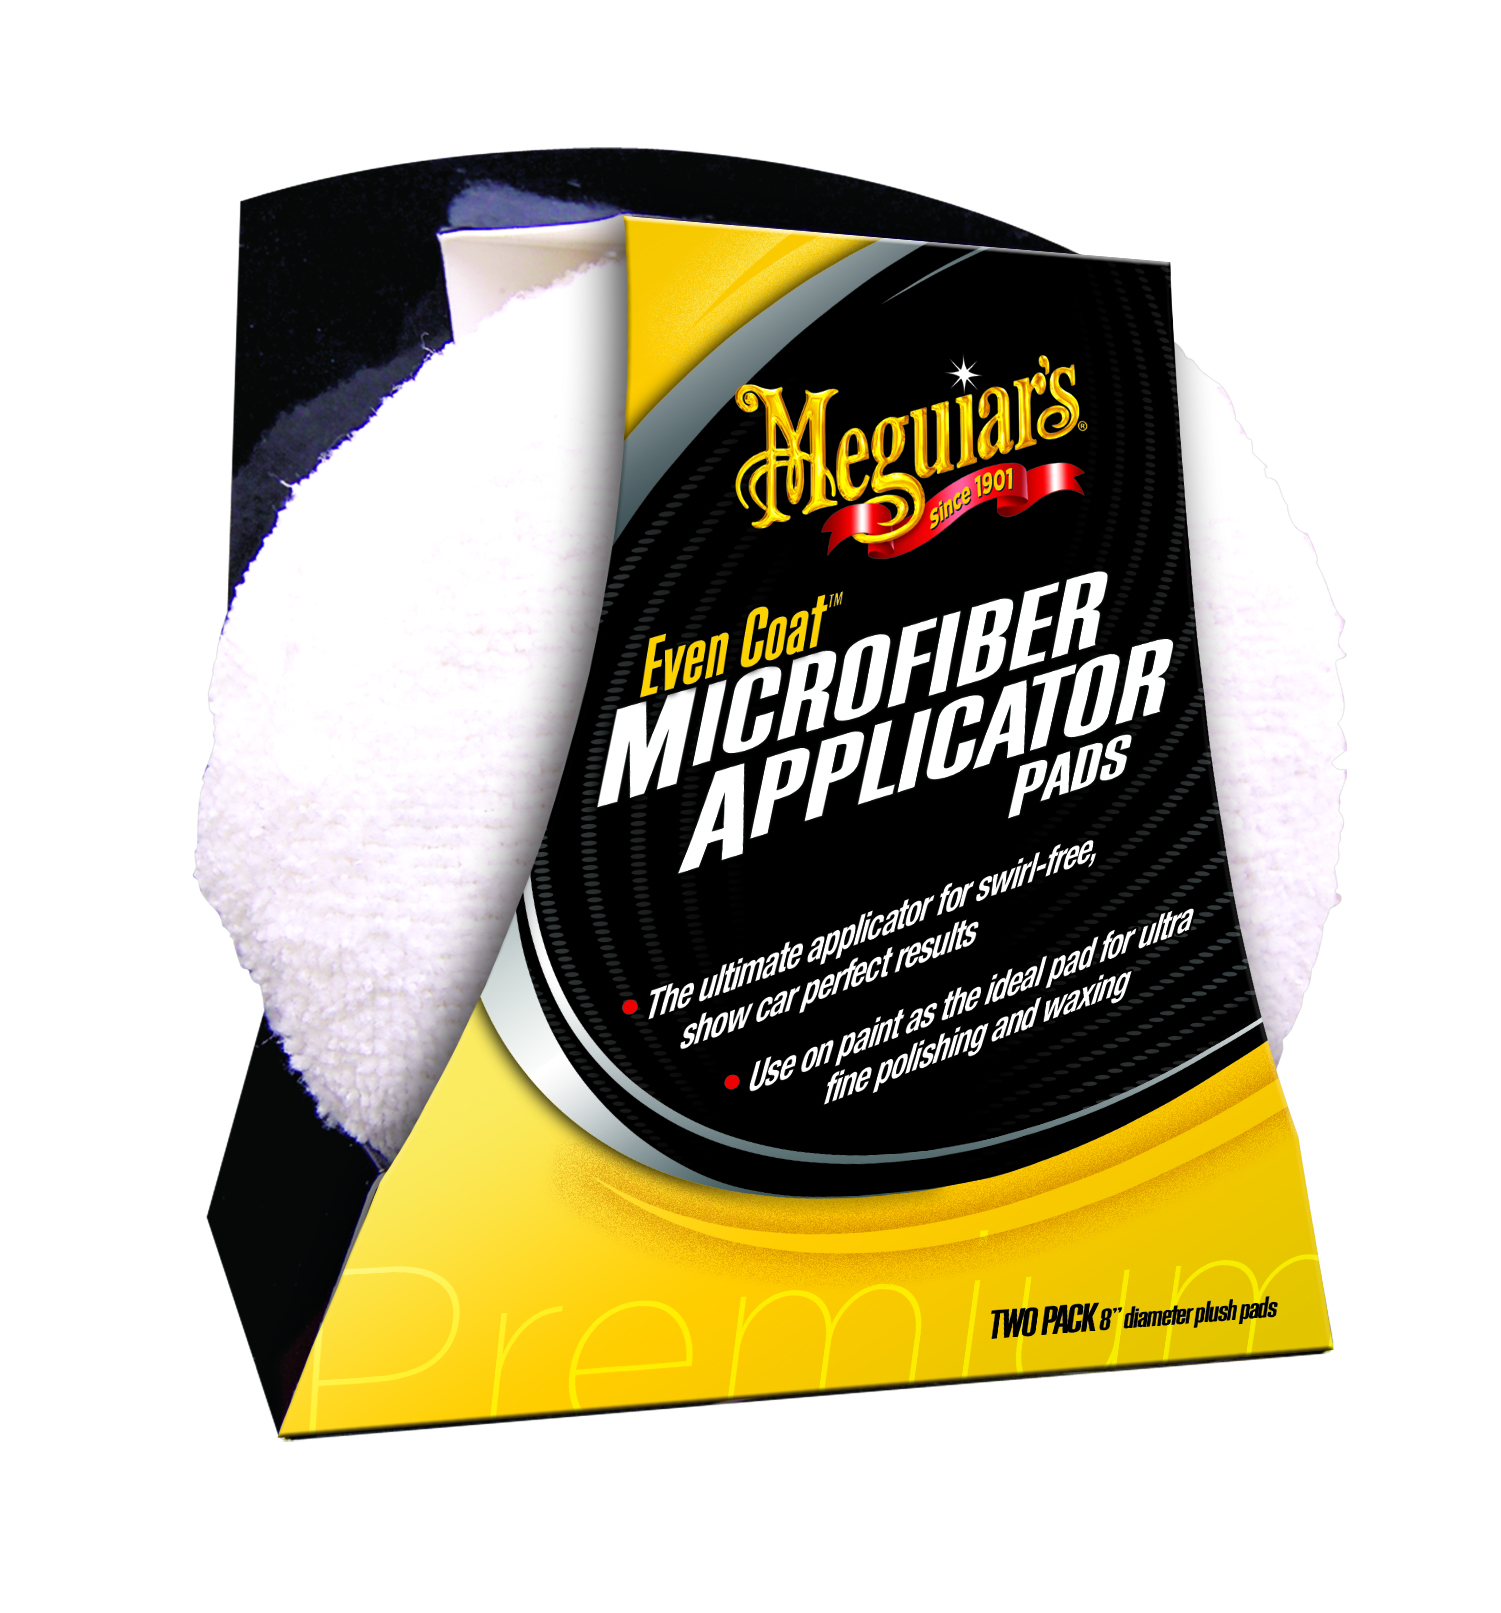 Meguiars Even Coat Microfiber Applicator 2er pack Mirkofaser Auftragsschwamm